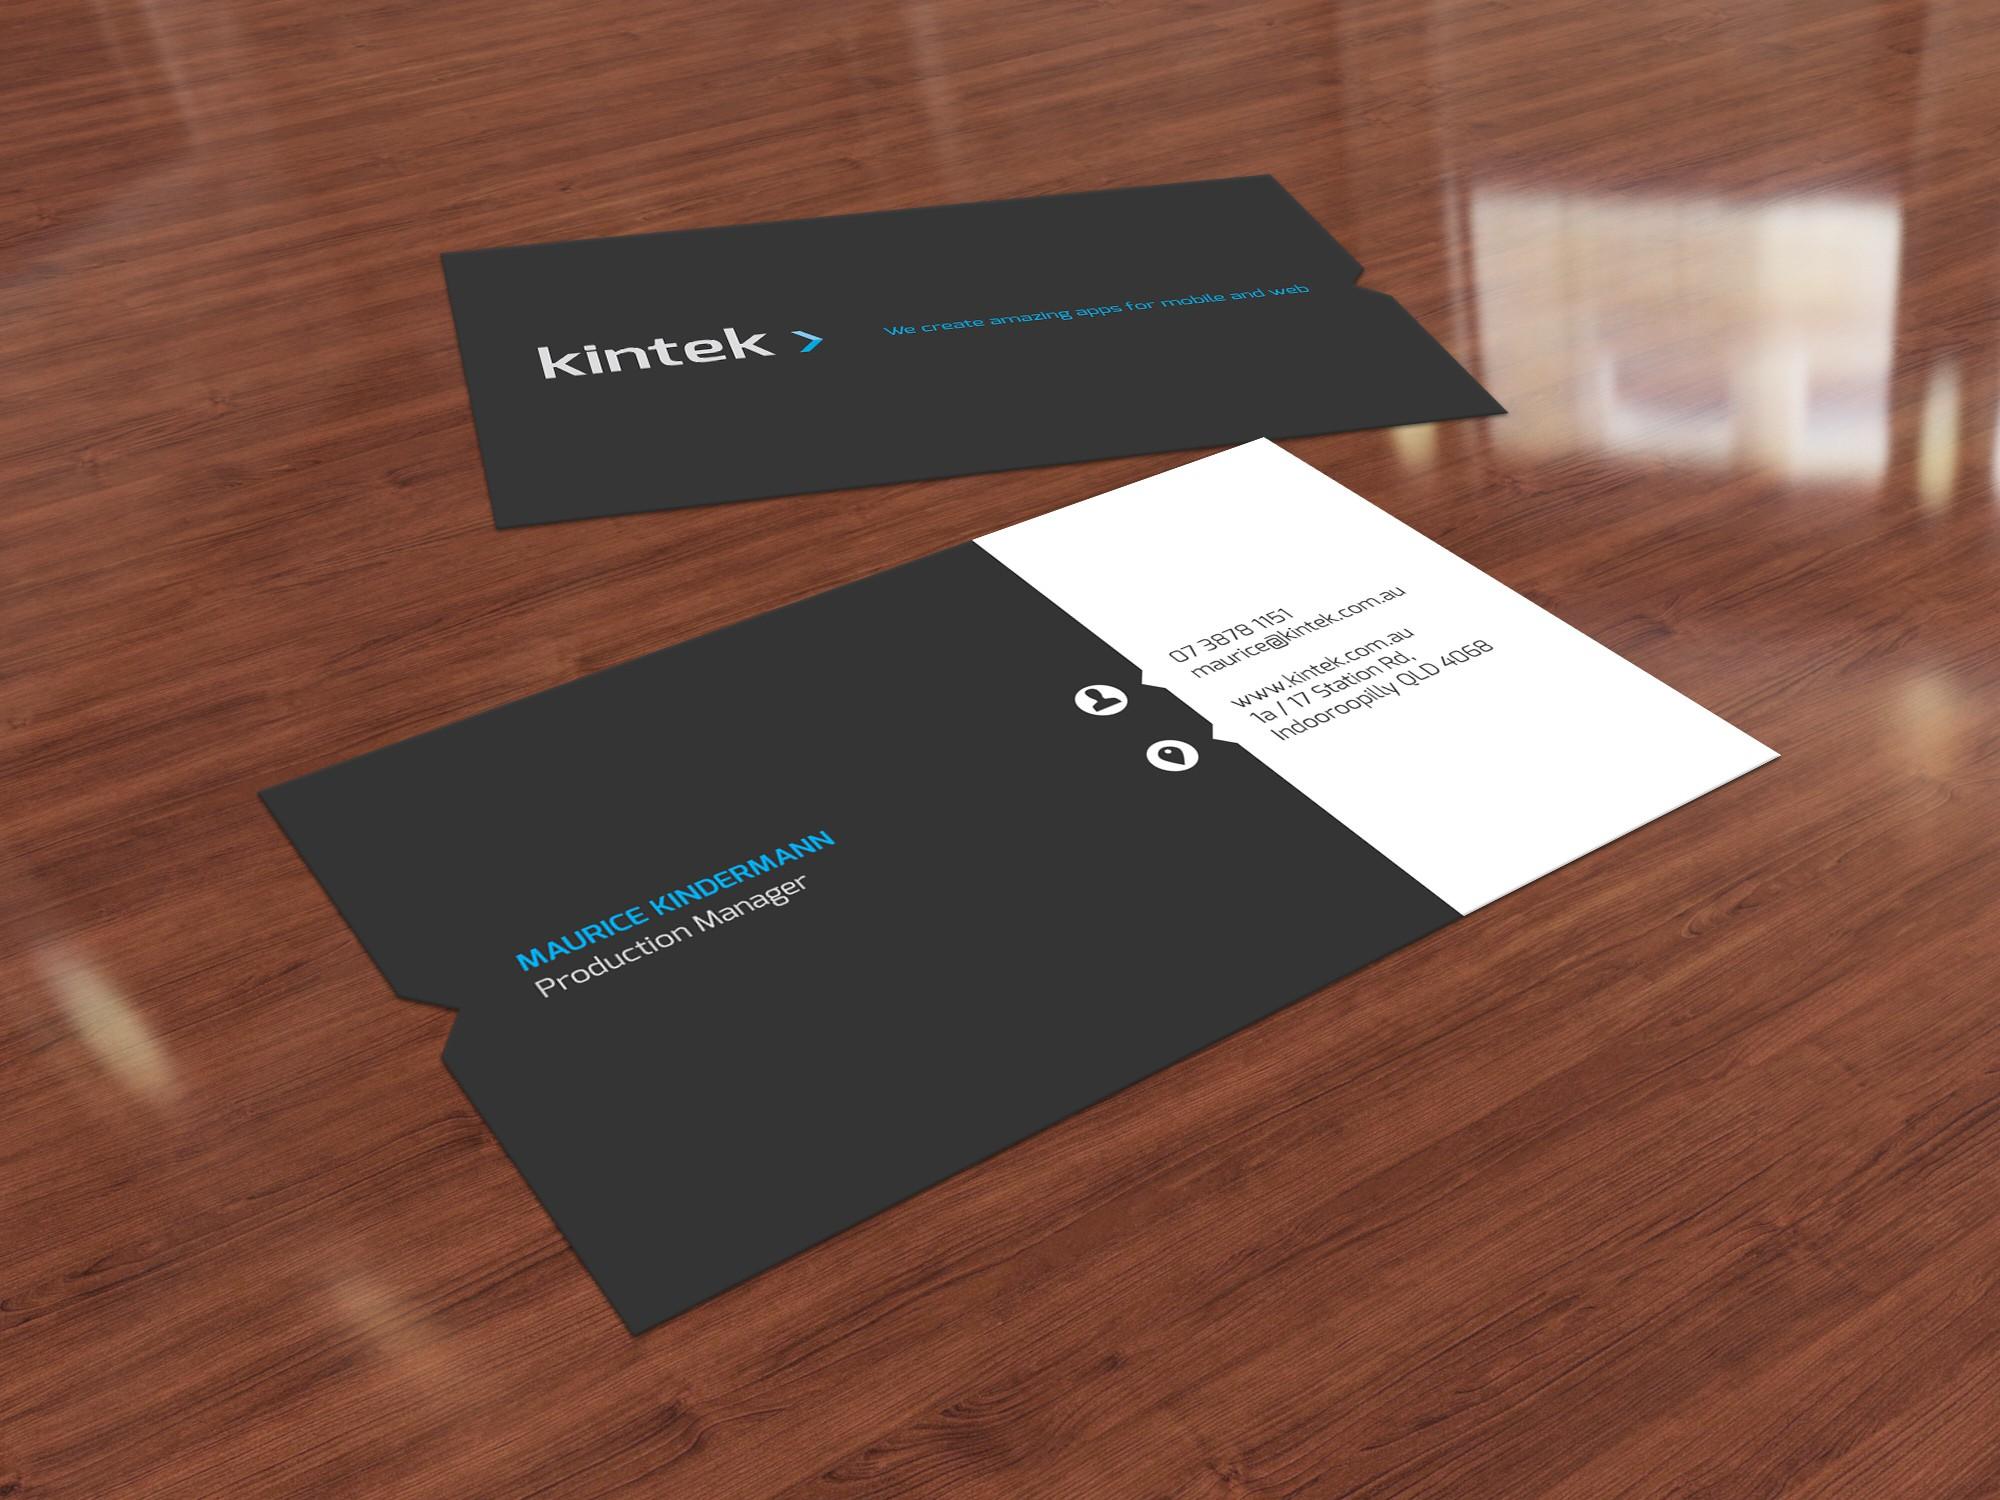 Kintek: Mobile App Dev Company Business Card